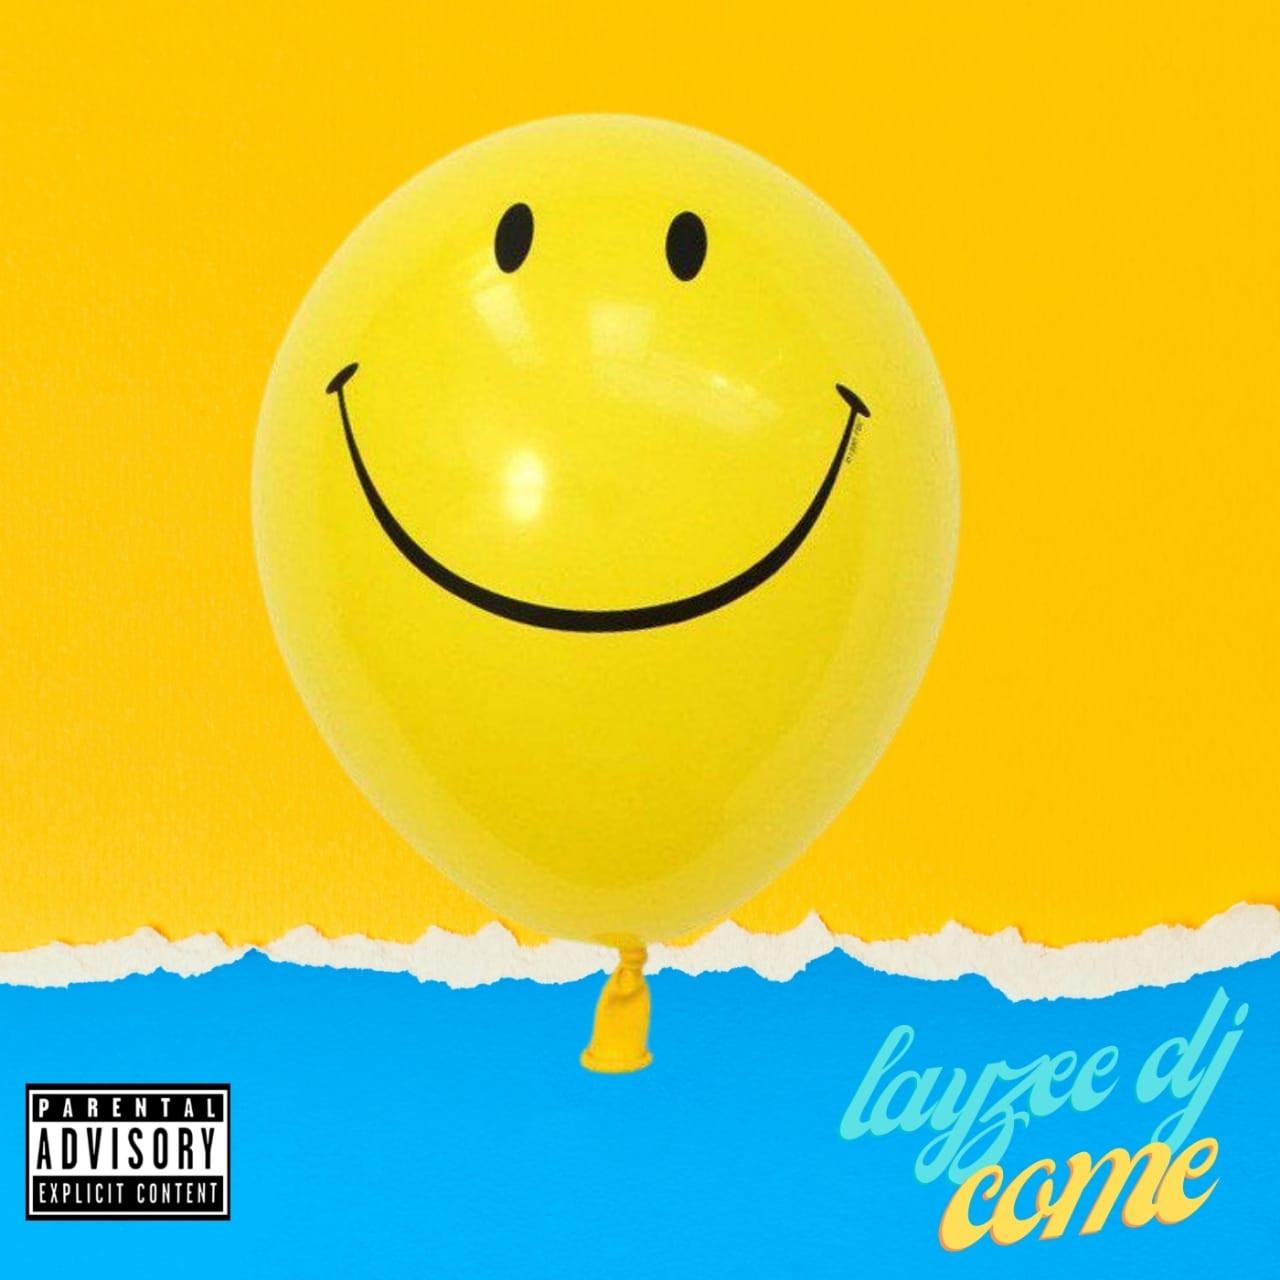 Layzee DJ Ft. MOONLIGHT AFRIQA - Come